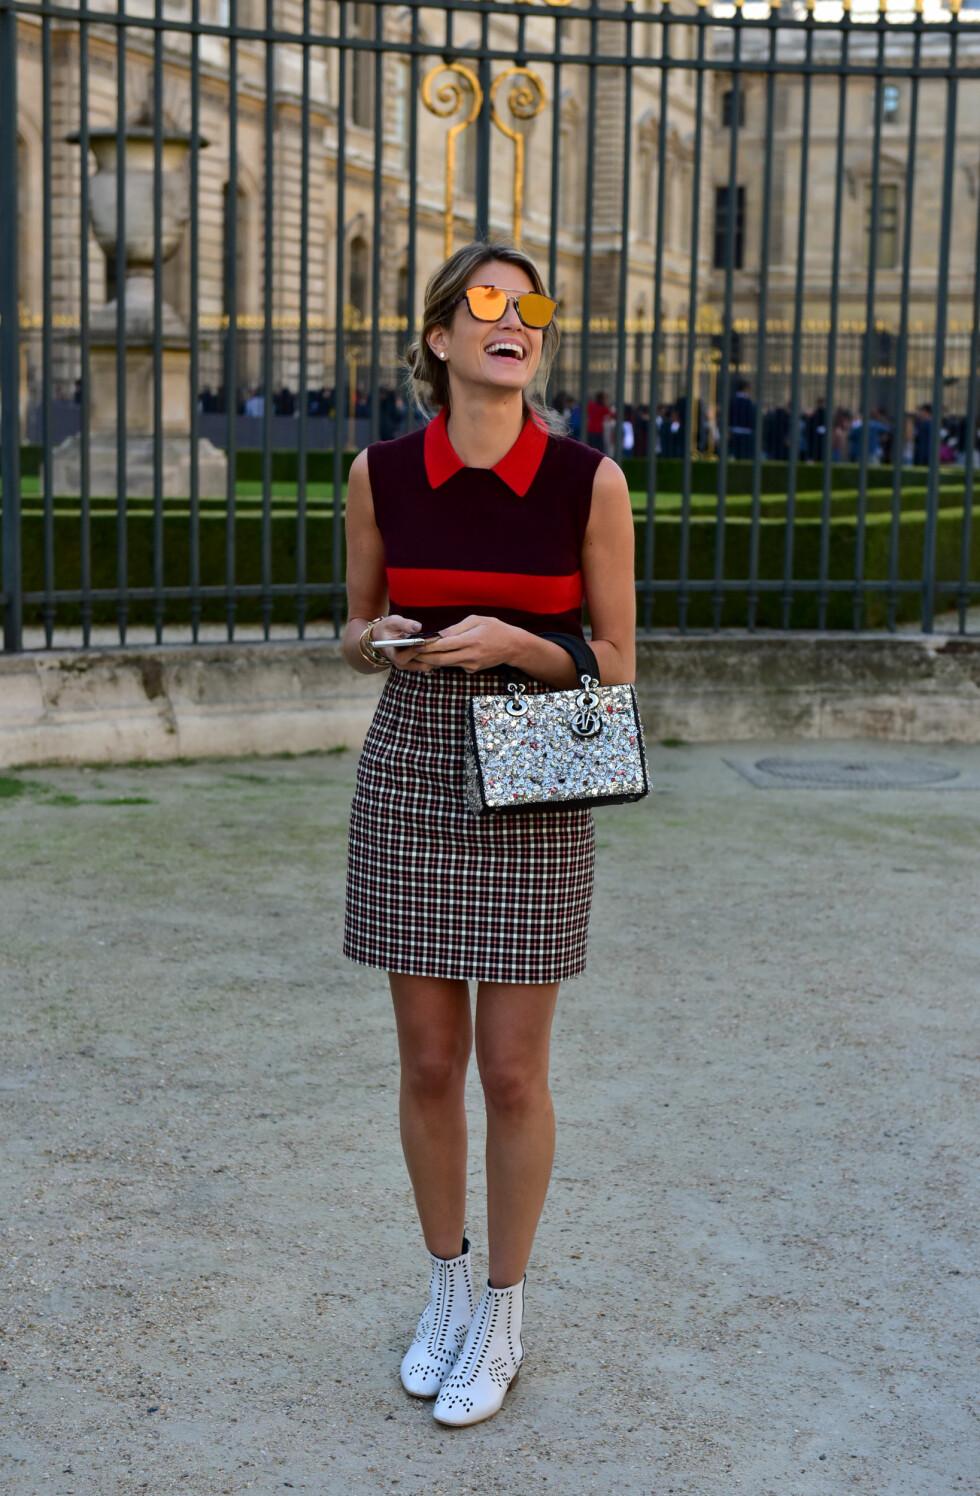 MØNSTERMIKS: Blogger Helena Bordon viser hvordan man kan mikse mønster uten at det blir total kræsj! Foto: DPA